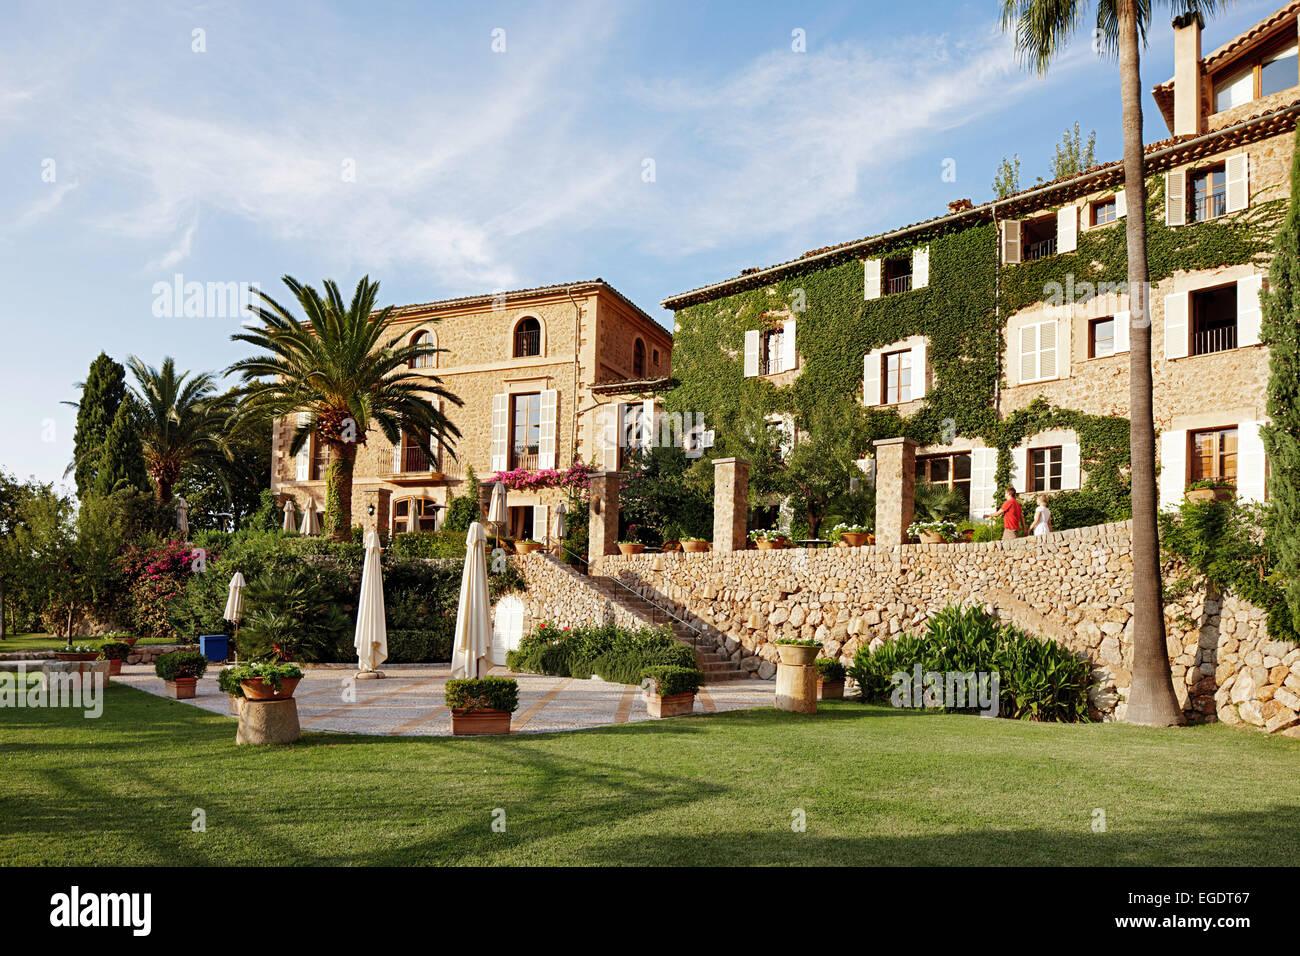 Außenaufnahme des Hotel La Residencia in Deia, Mallorca, Spanien Stockbild